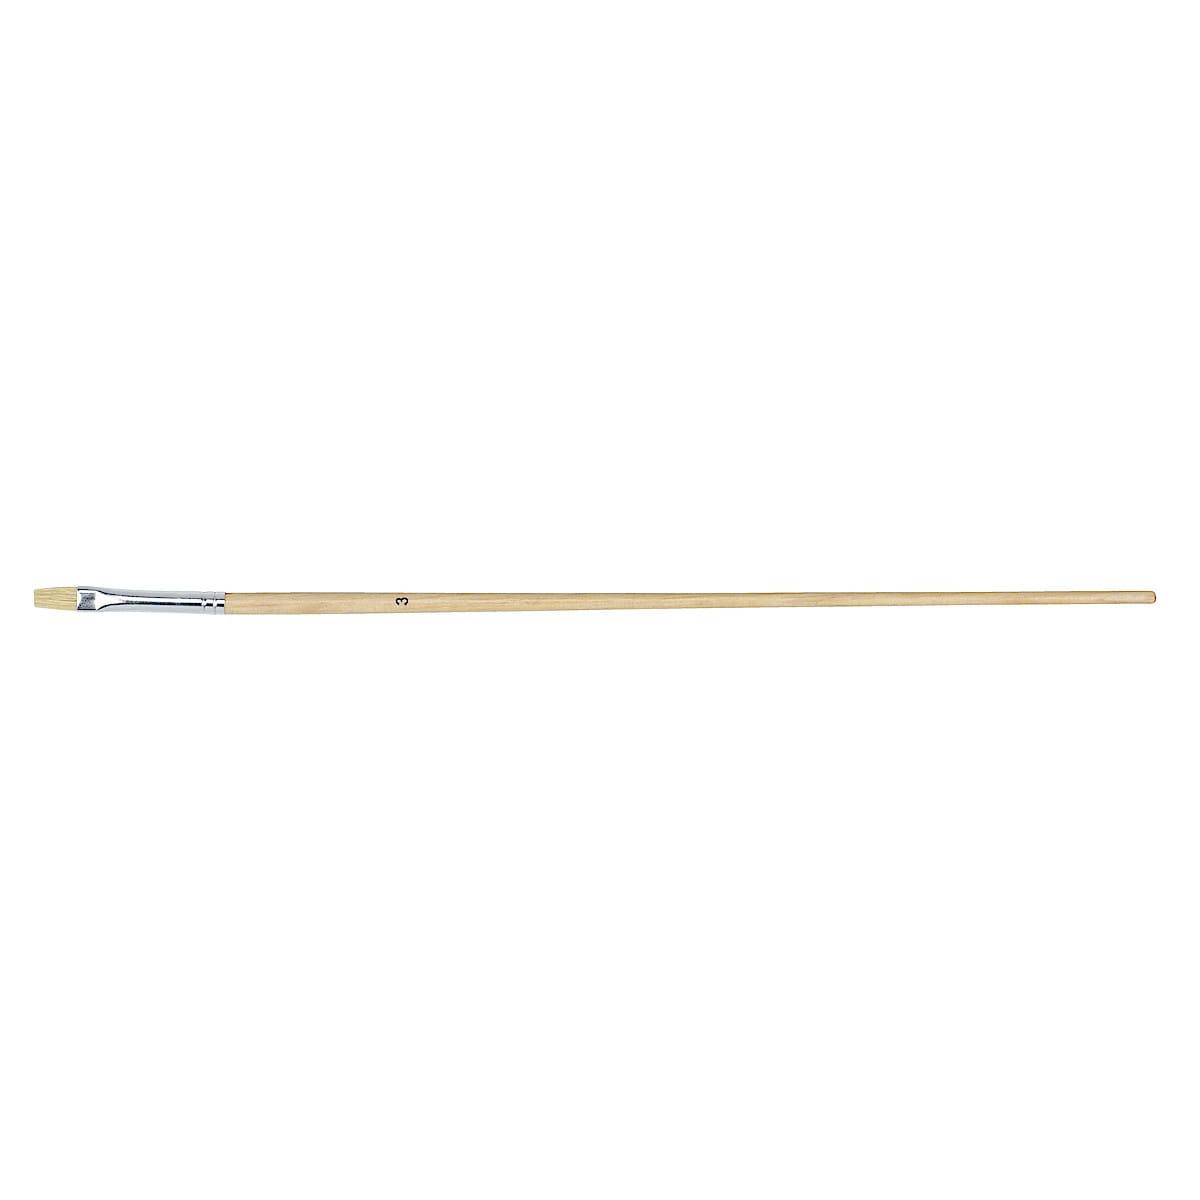 Sang Oil/Acrylic 12 Brush Set